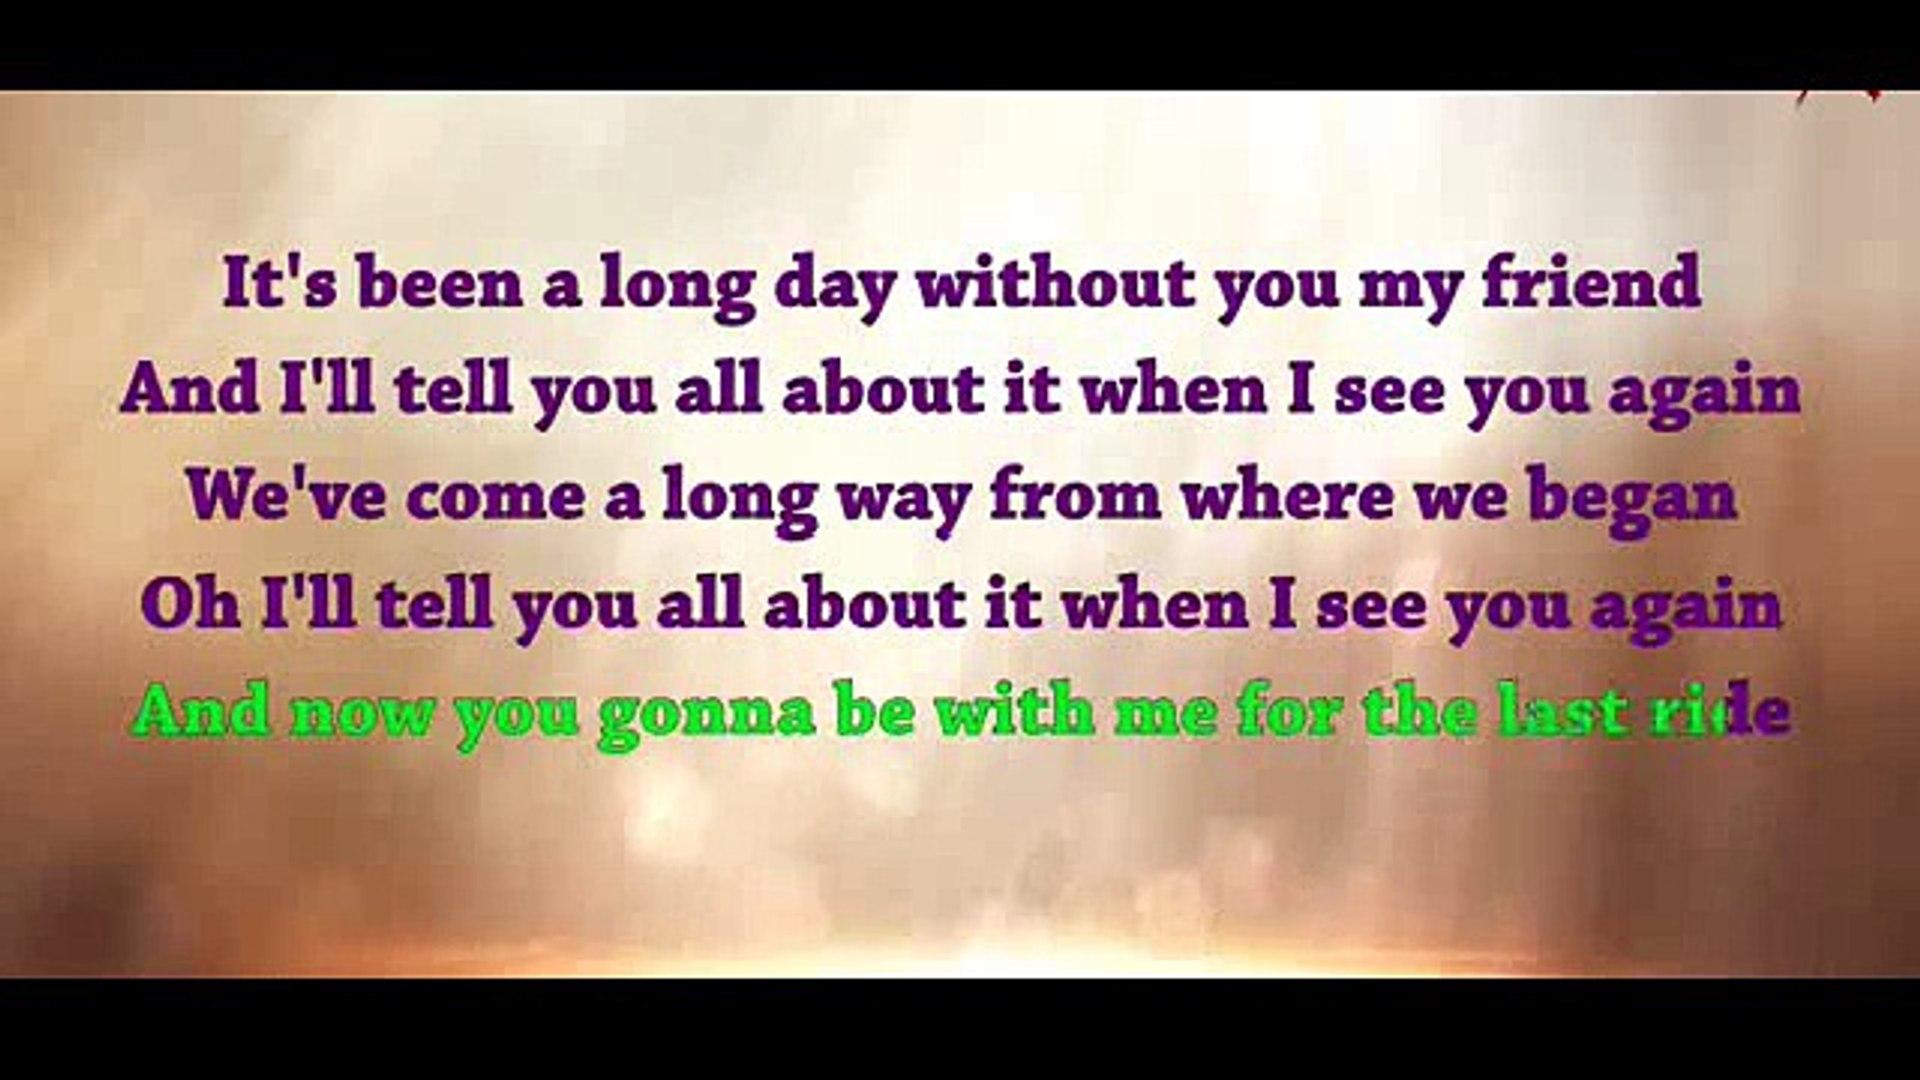 See You Again Charlie Puth Lyrics Karaoke idea gallery